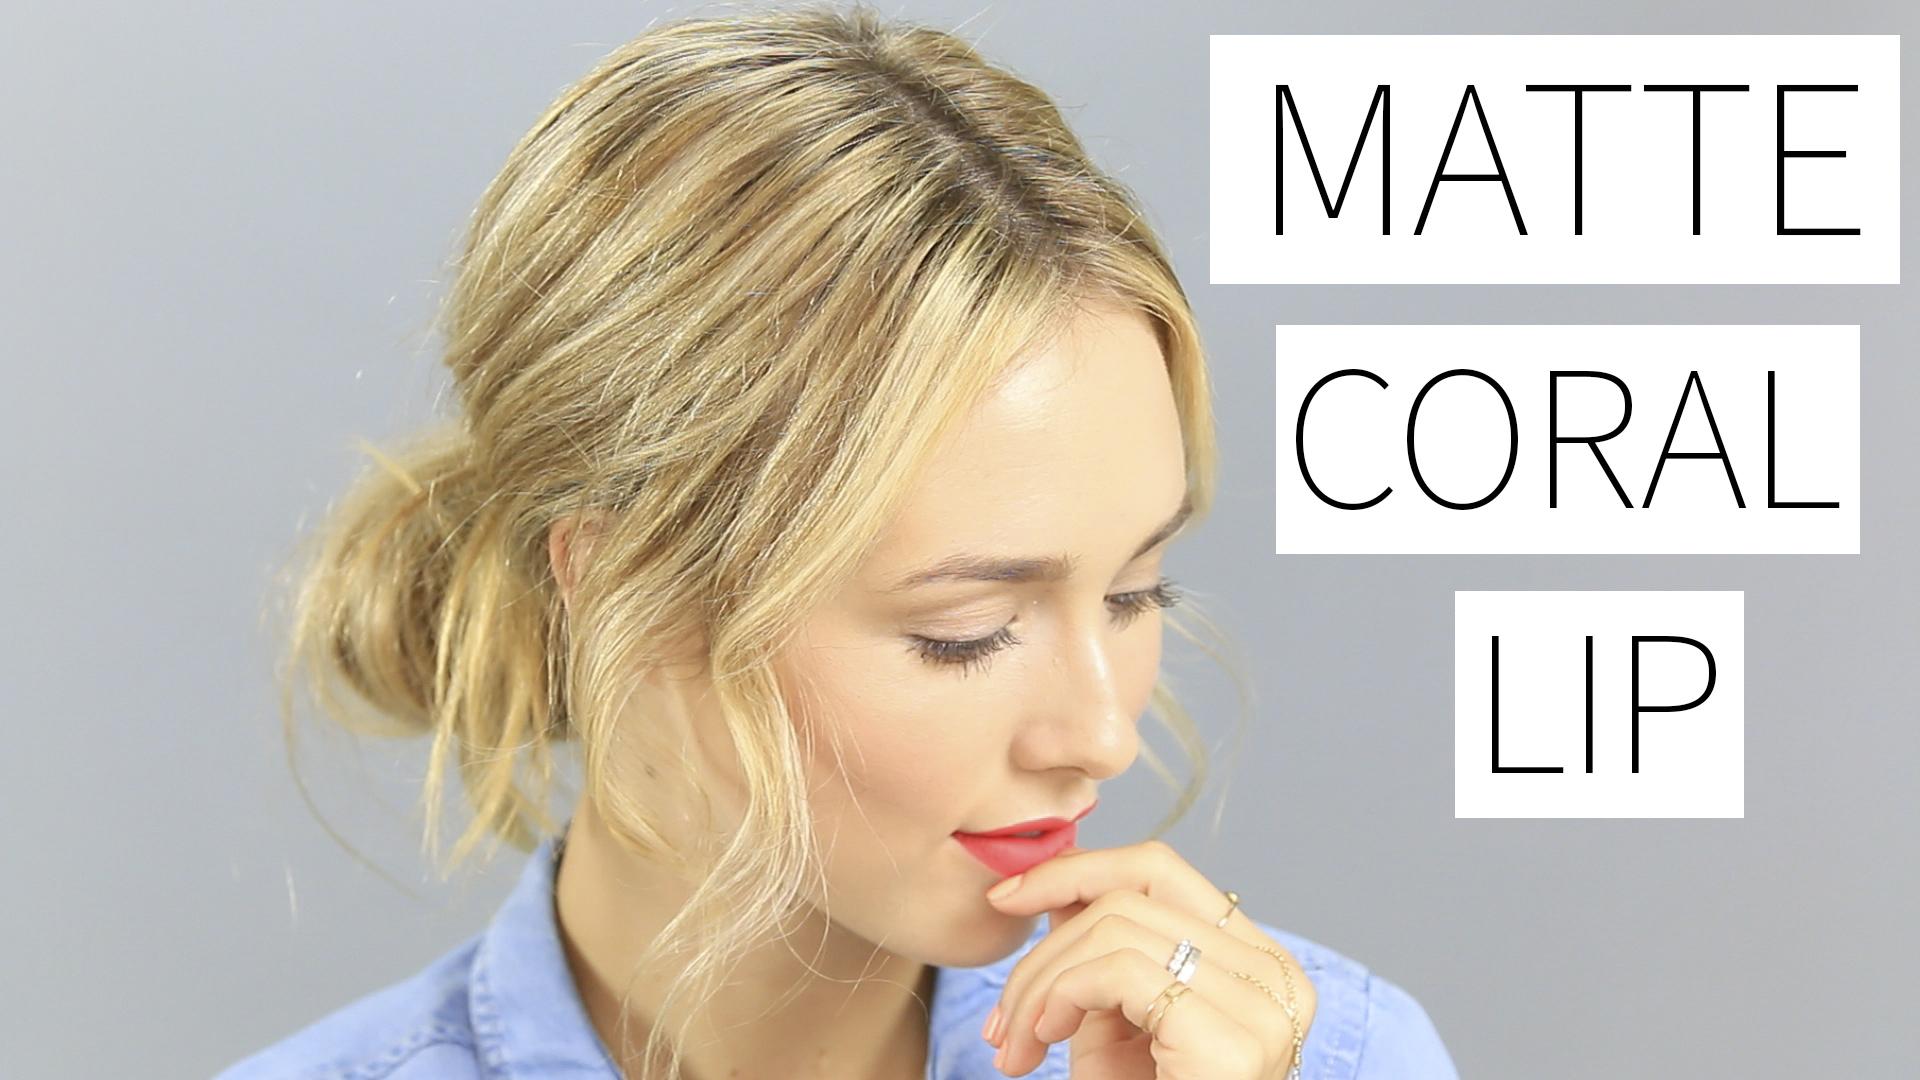 Matte Coral Lip Colourpop